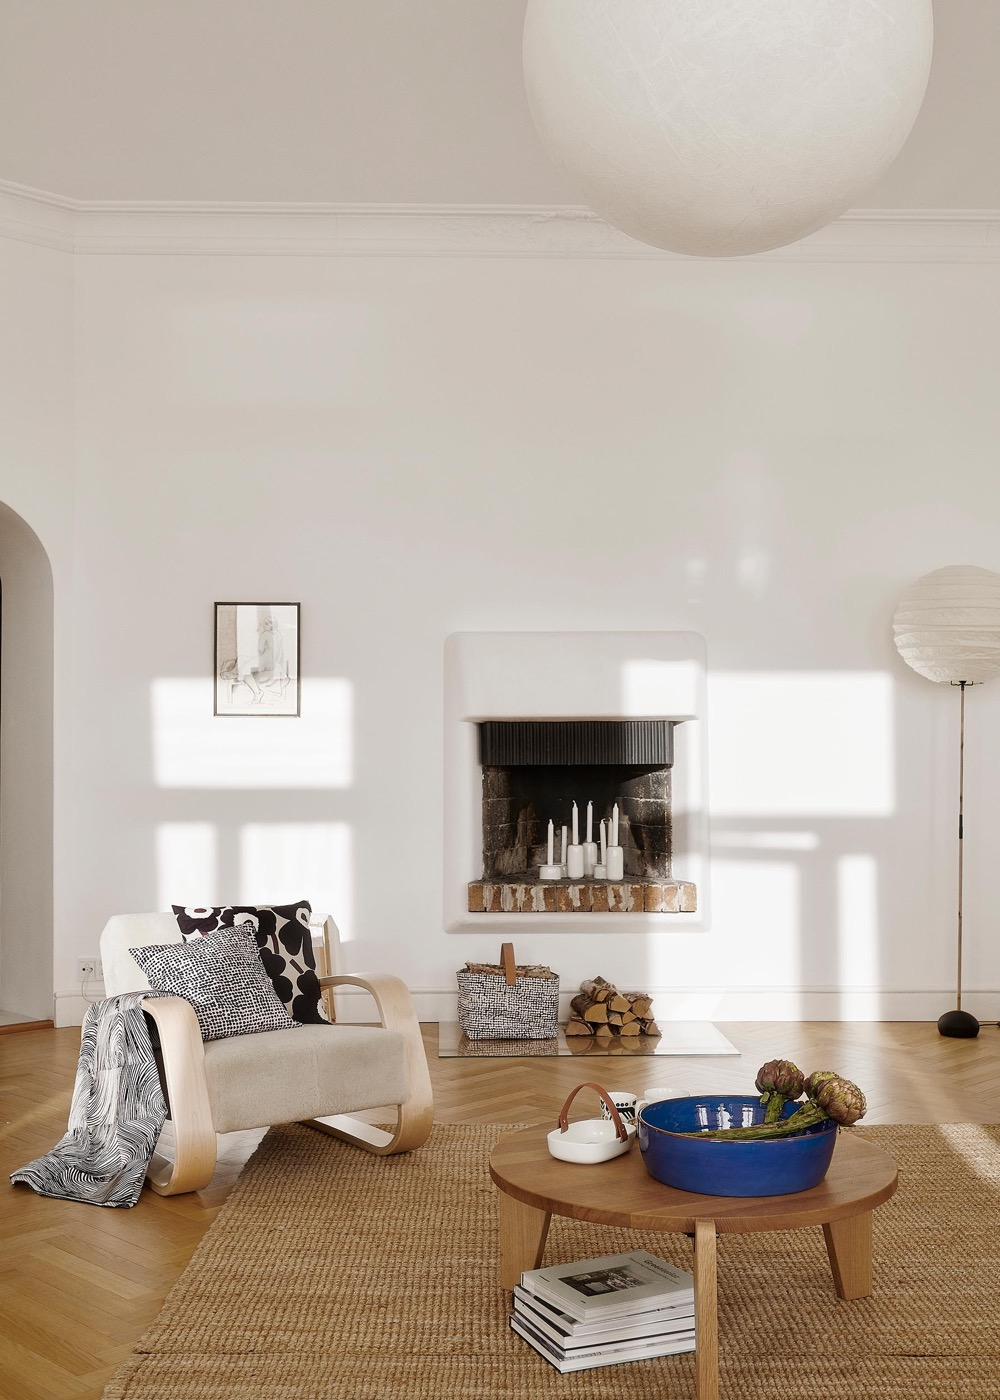 Marimekko-fall-2018-home-collection-the-impression-06